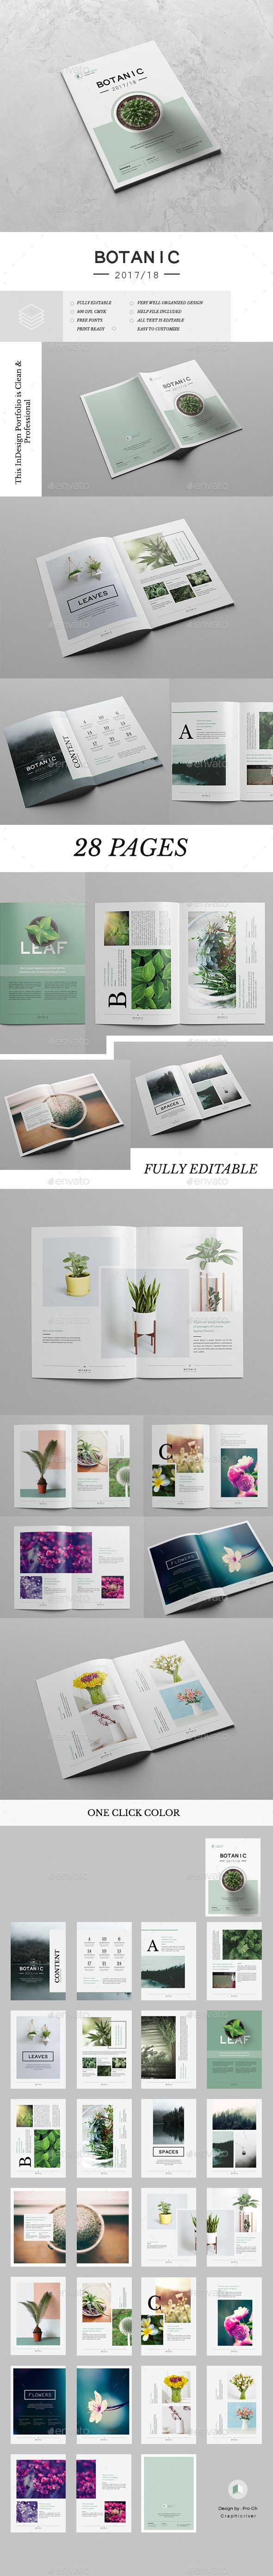 Botanic Portfolio — InDesign INDD #spaces #green • Download ➝ https://graphicriver.net/item/botanic-portfolio/19499273?ref=pxcr